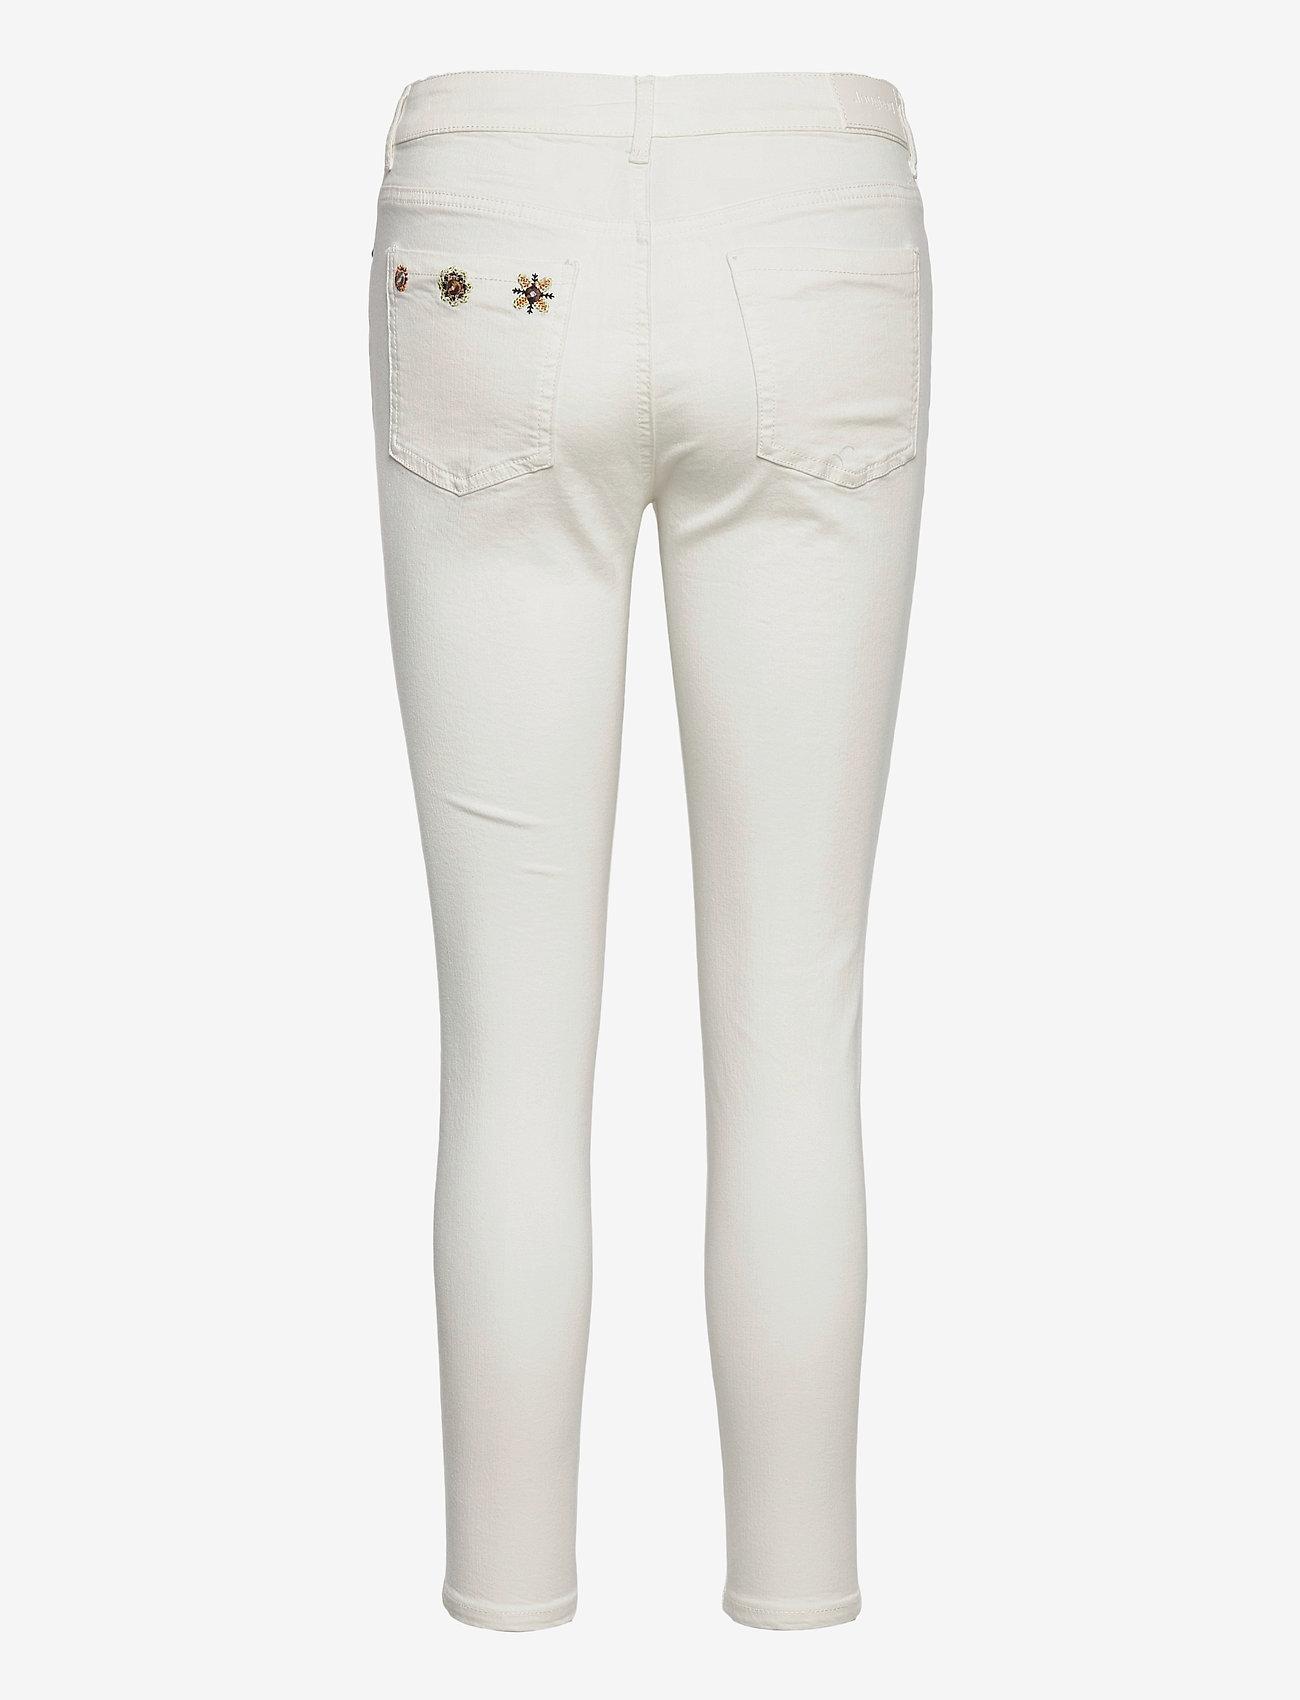 Desigual - DENIM AUSTRIA - slim jeans - blanco nieve - 1